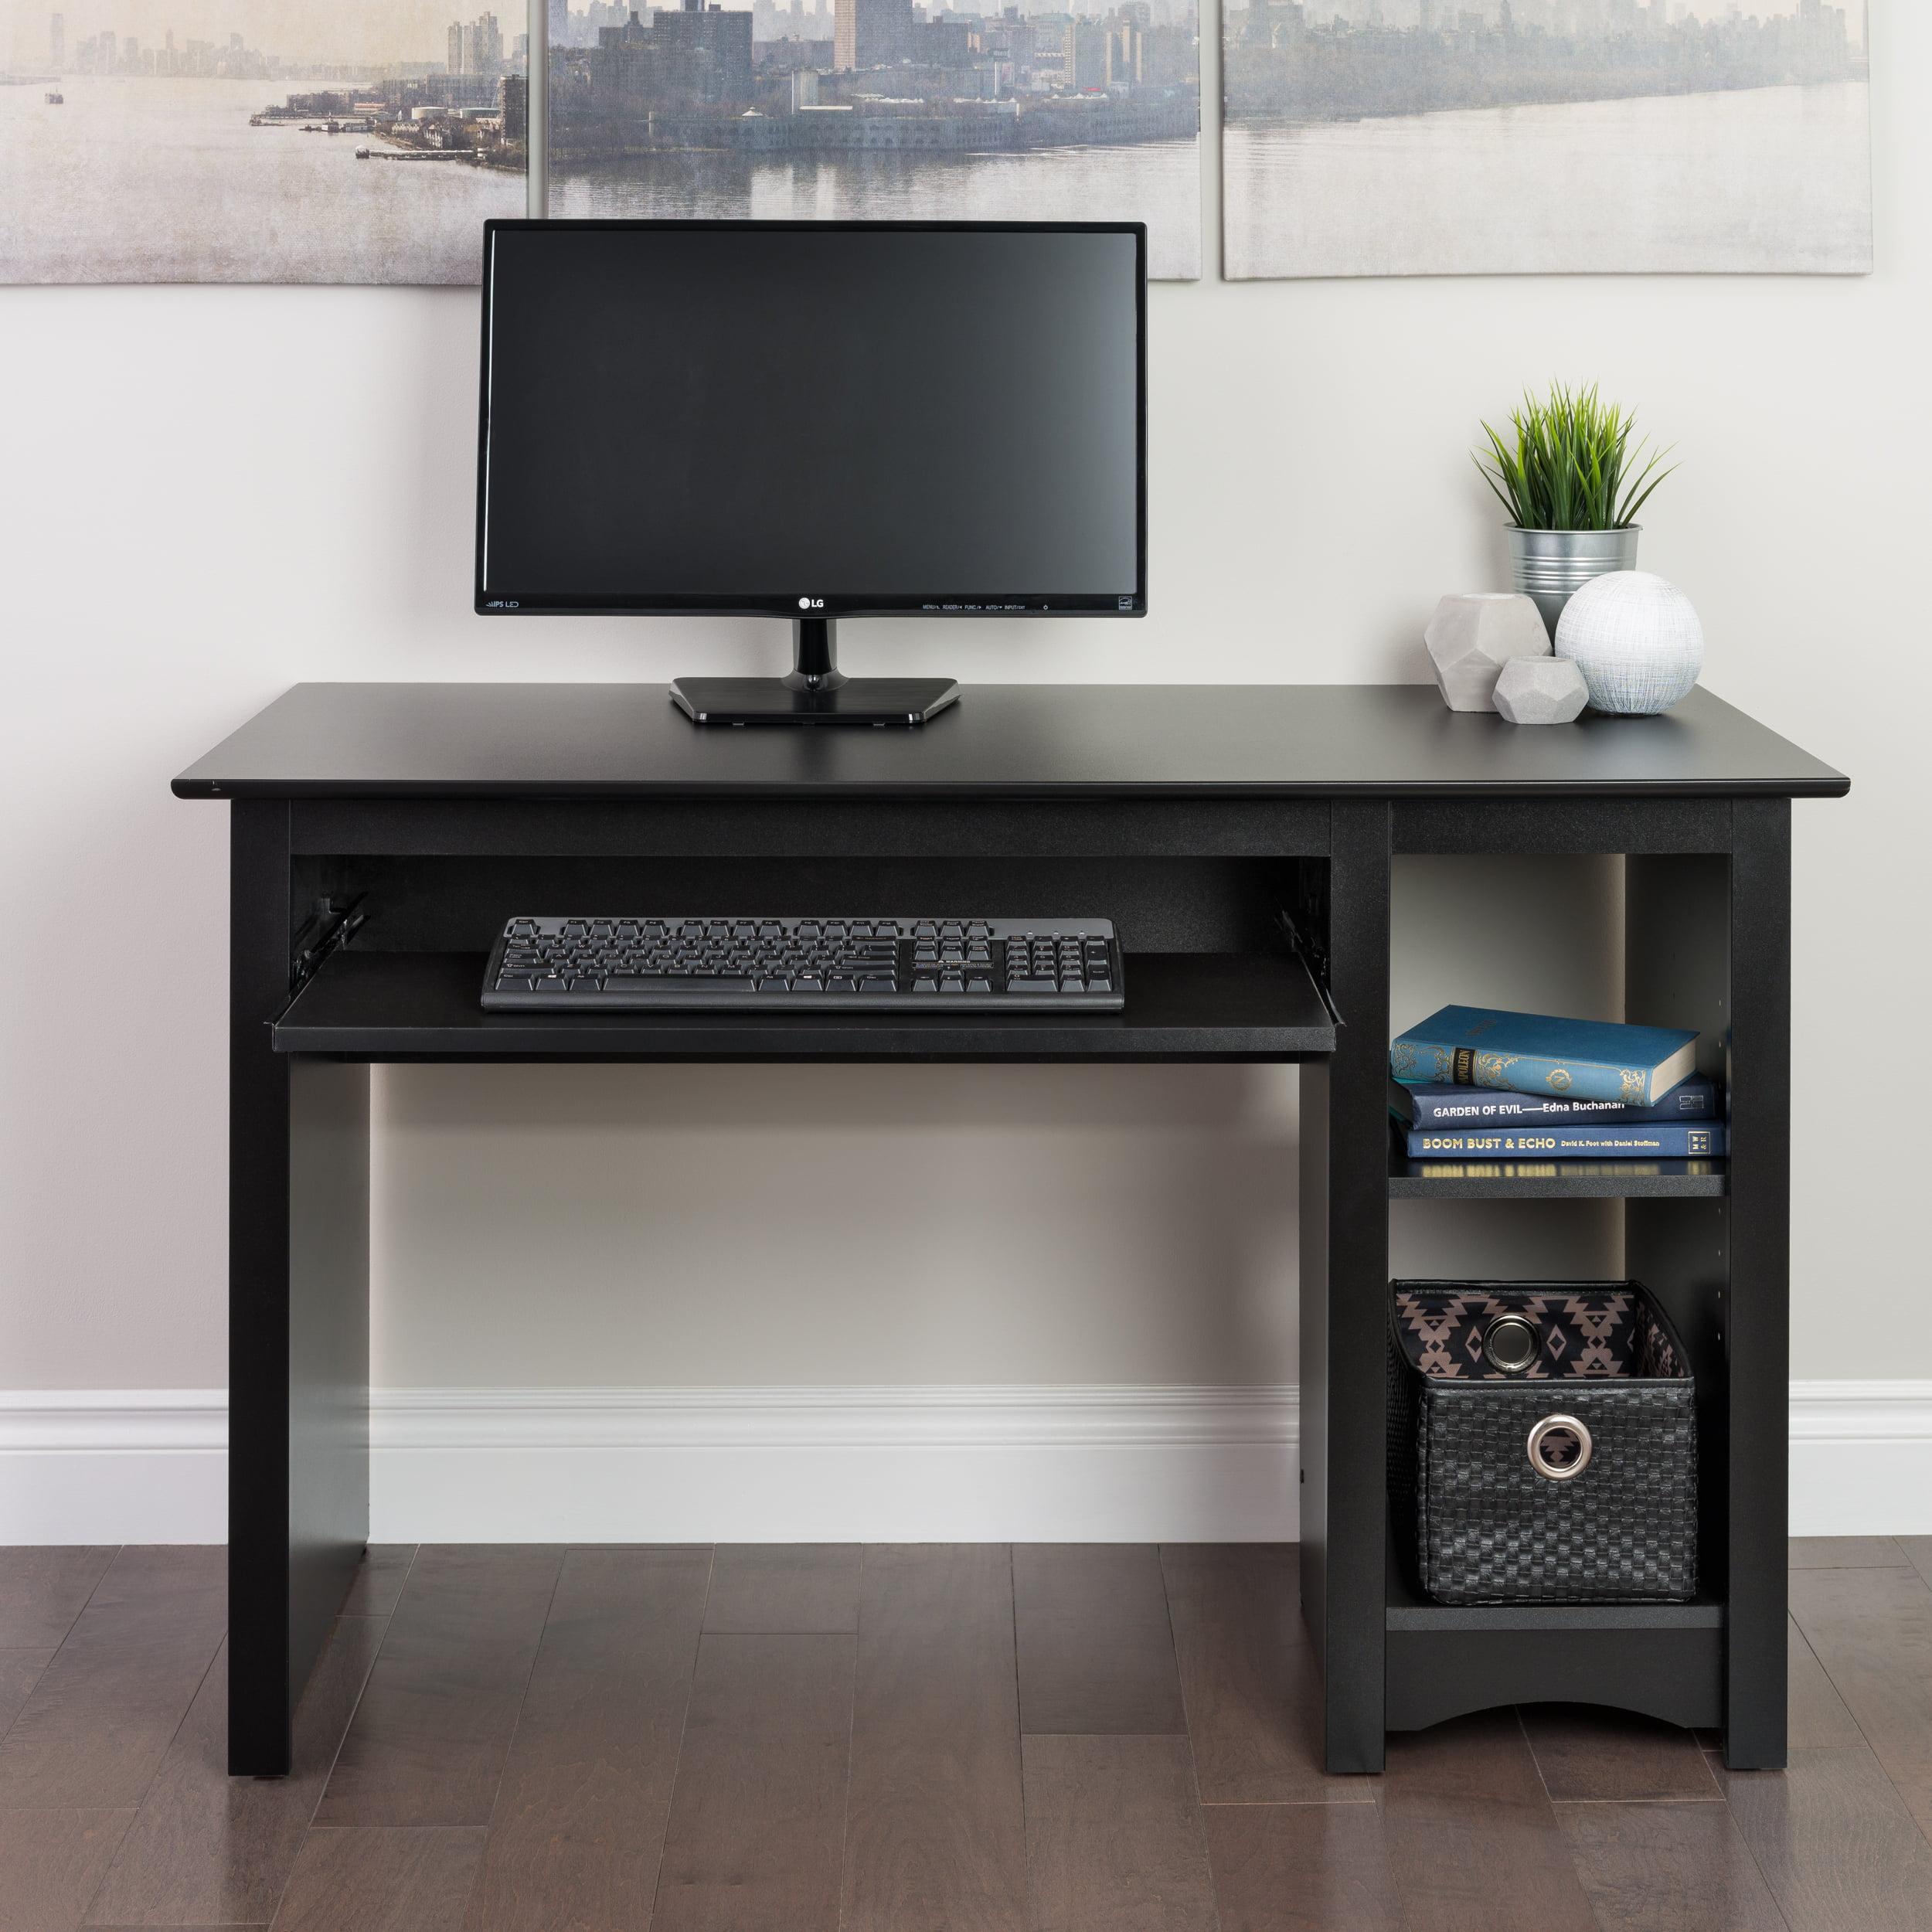 Black Wood Computer Student Desk Office Business Bedroom Table